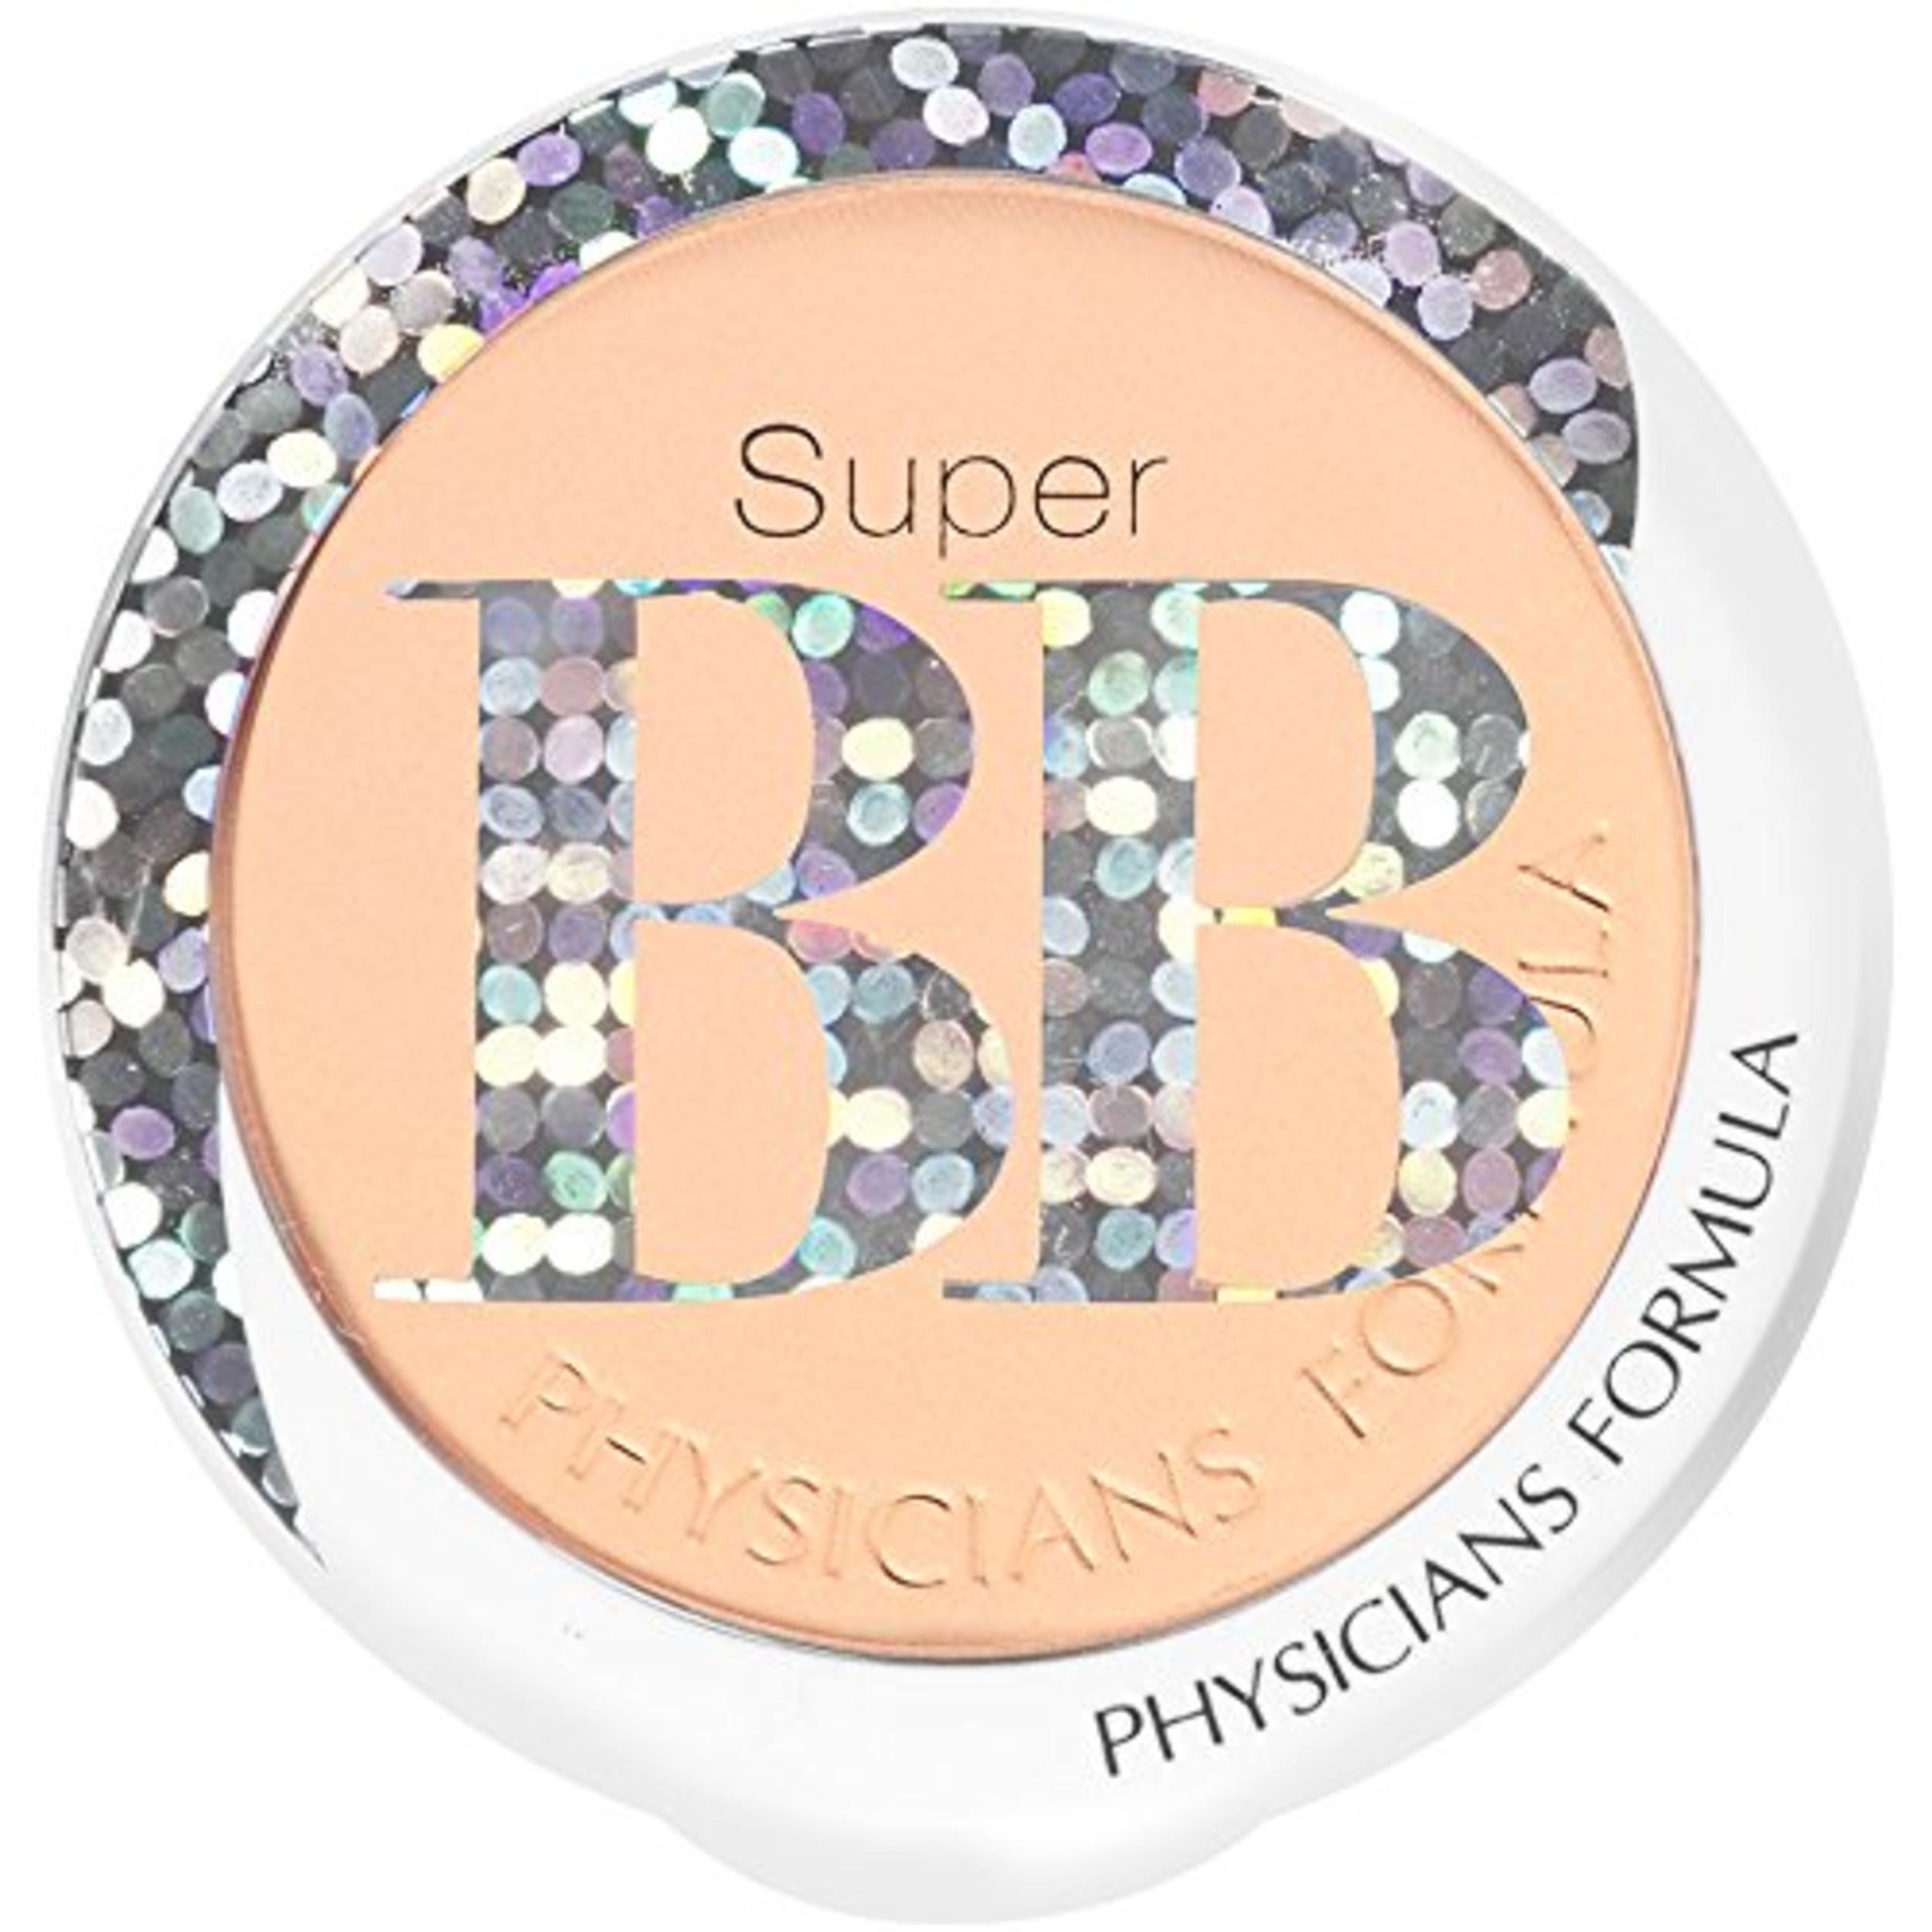 Physicians Formula Super BB™ 10-in-1 Beauty Balm Powder, Medium/Deep